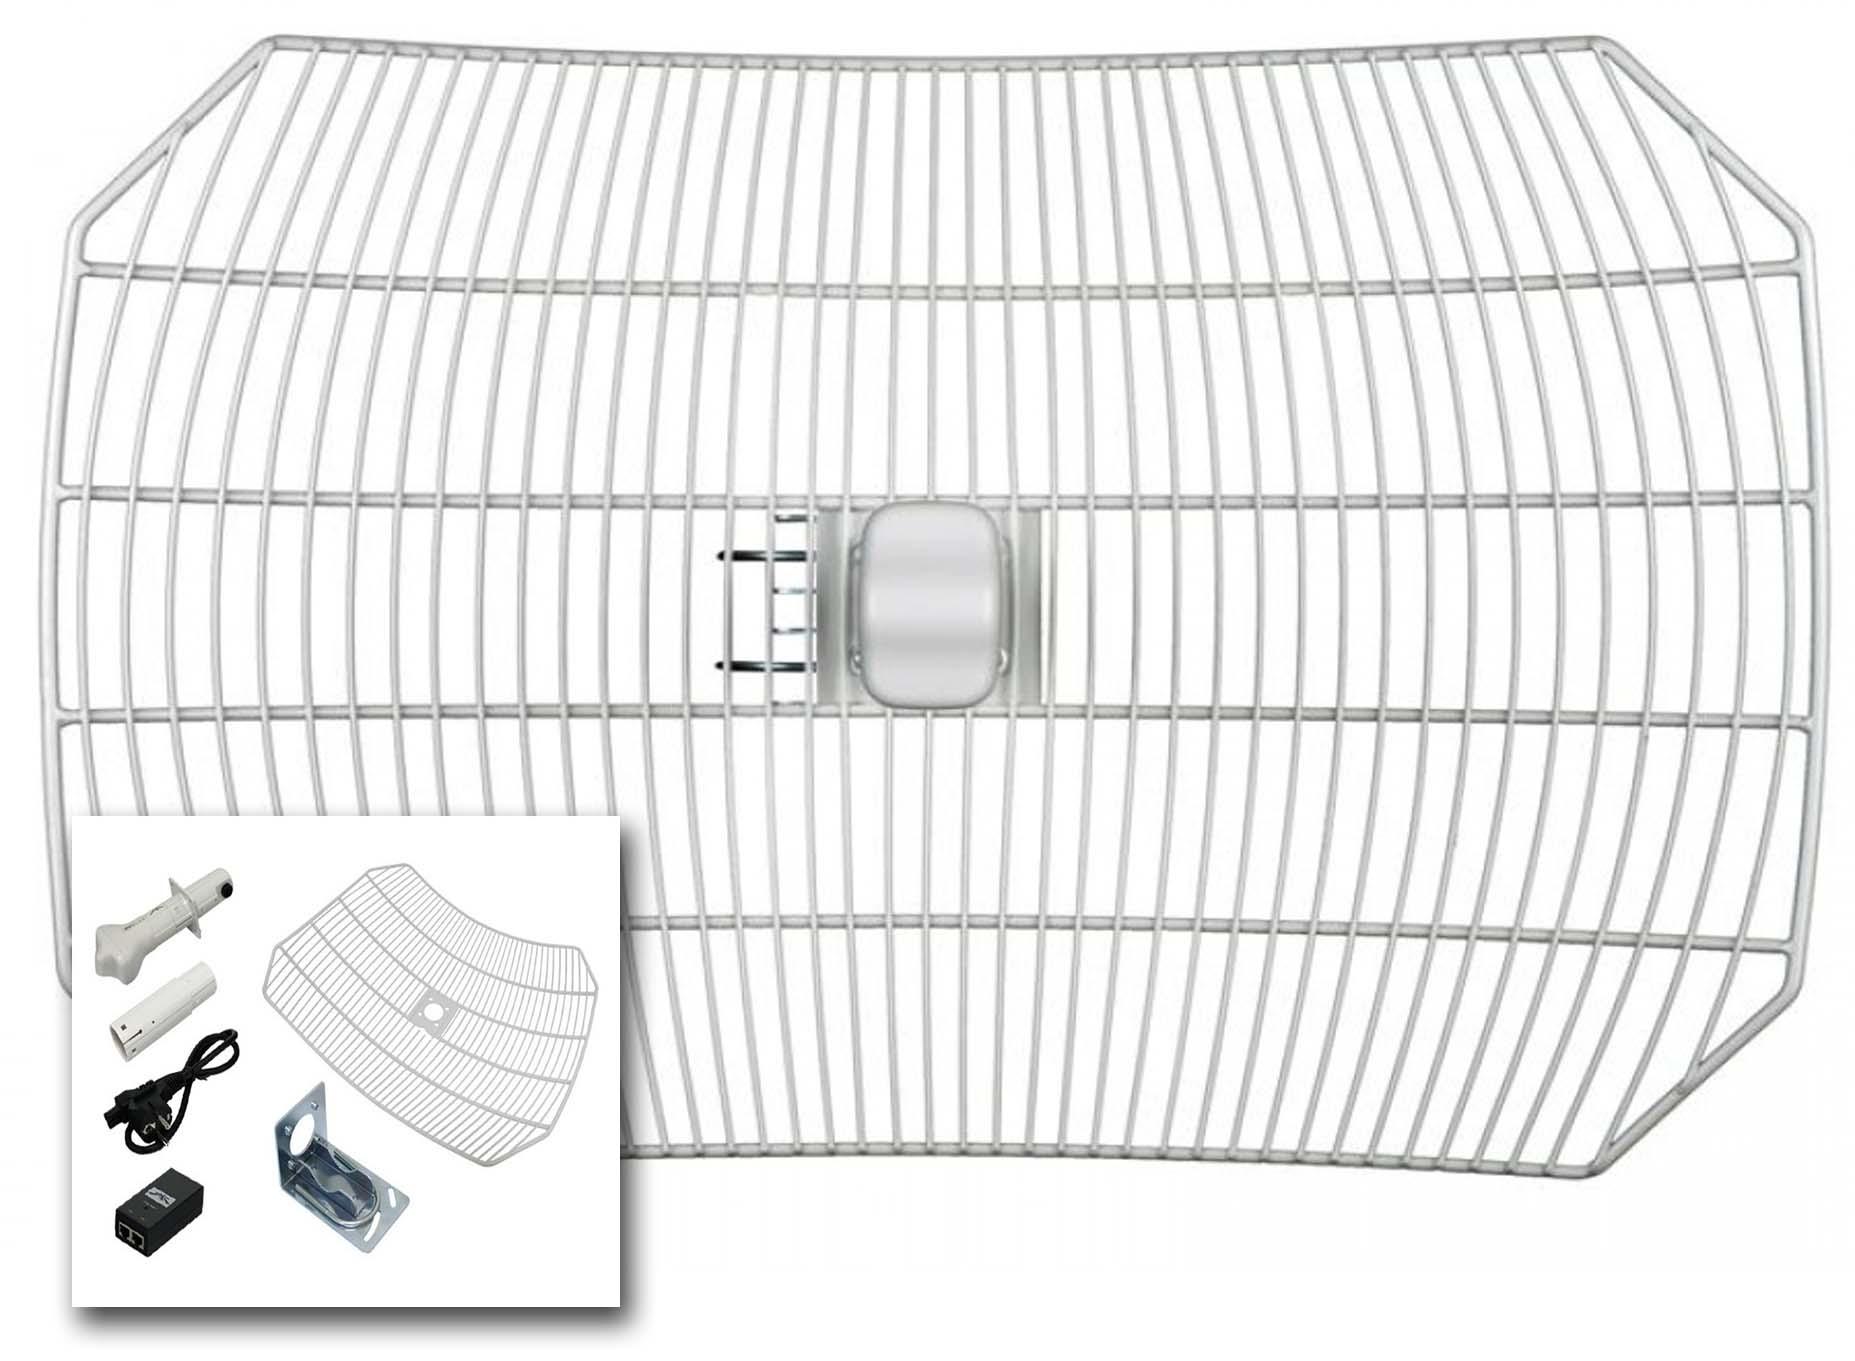 jual harga ubiquiti airgrid m5 23dbi antenna grid  m2